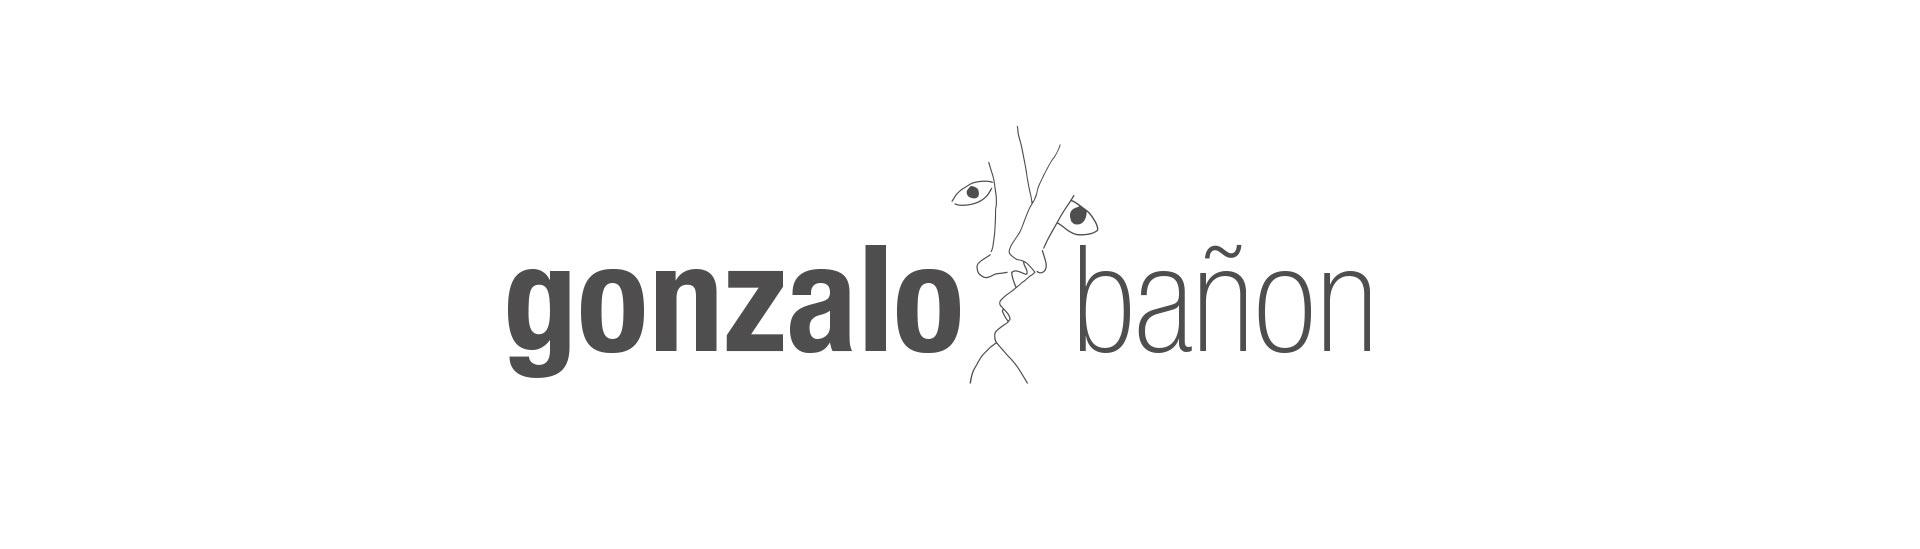 fondo_logo